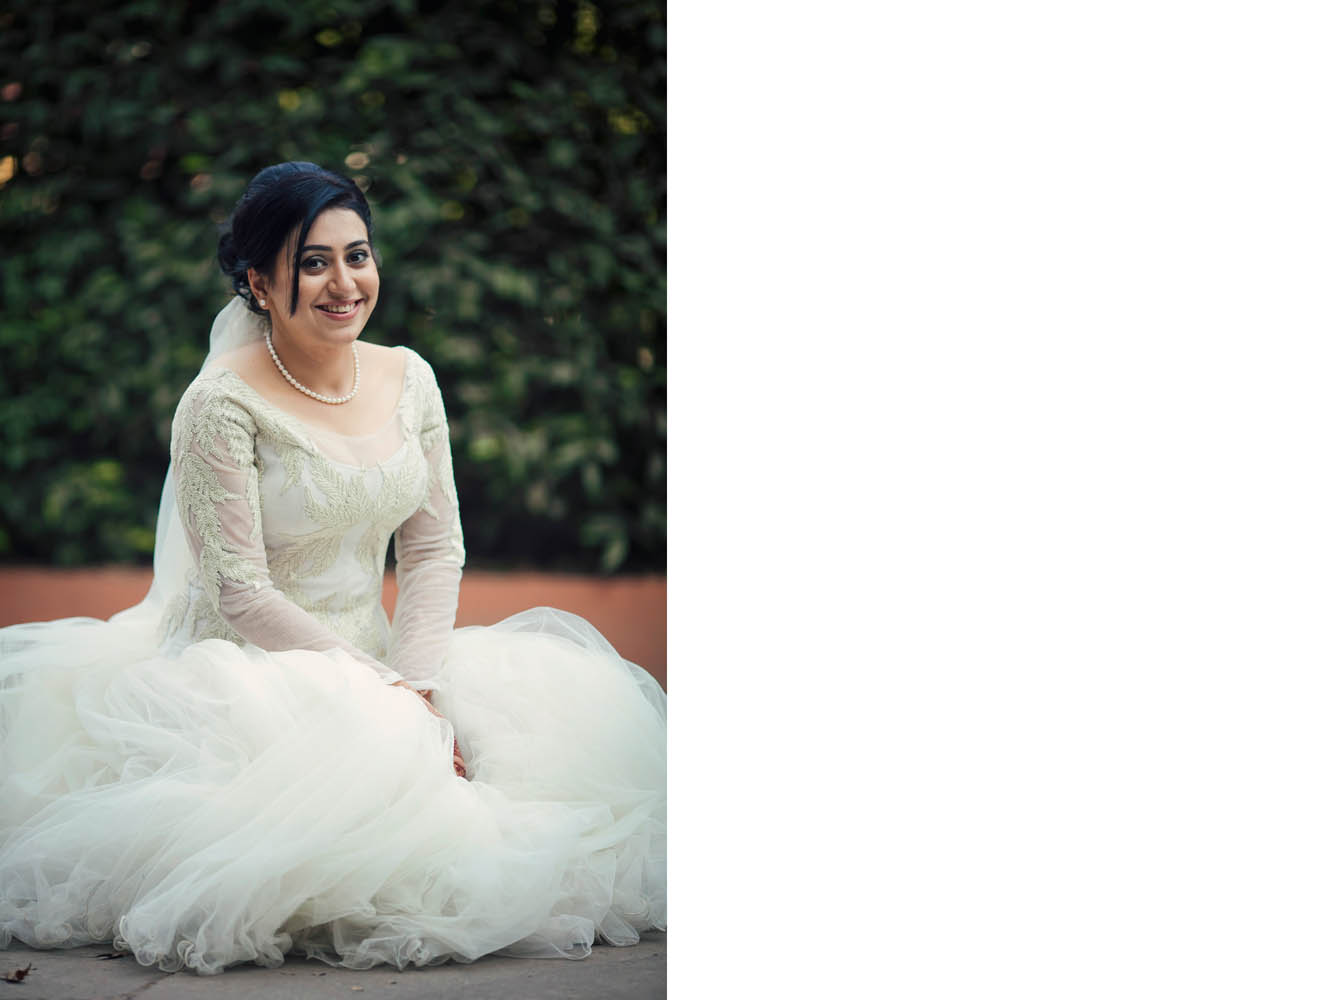 christian-wedding-12.jpg